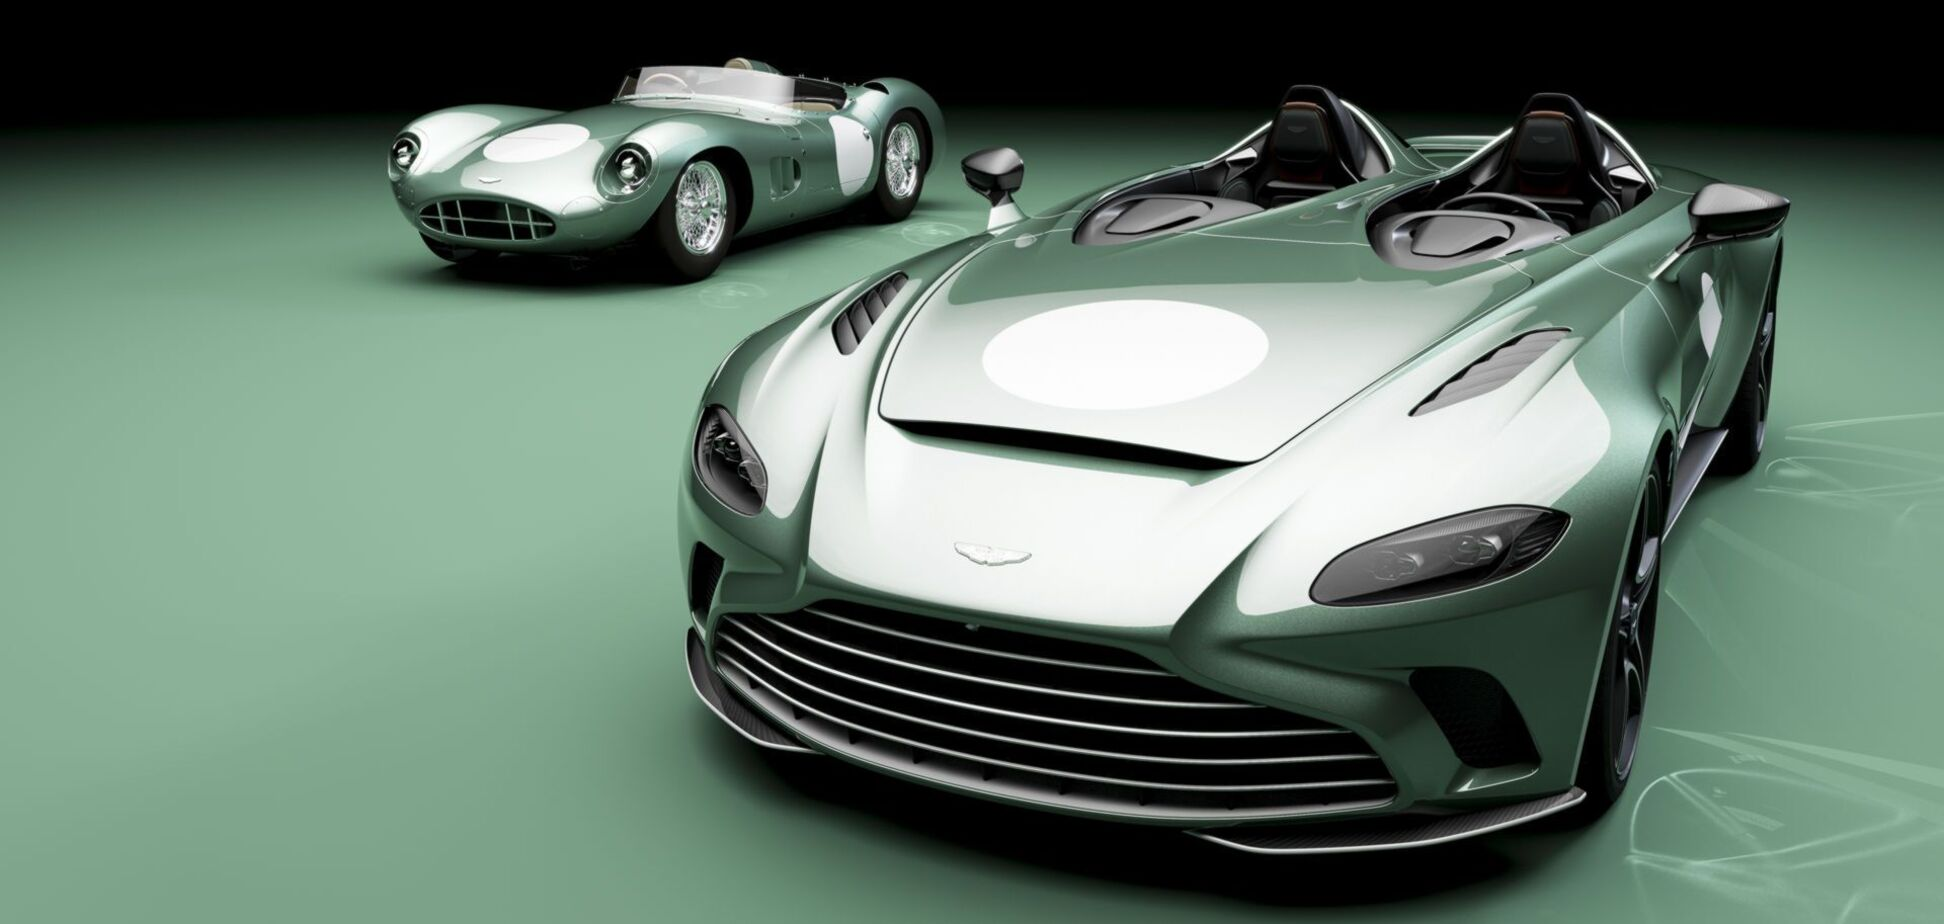 Aston Martin презентував ексклюзивну версію V12 Speedster